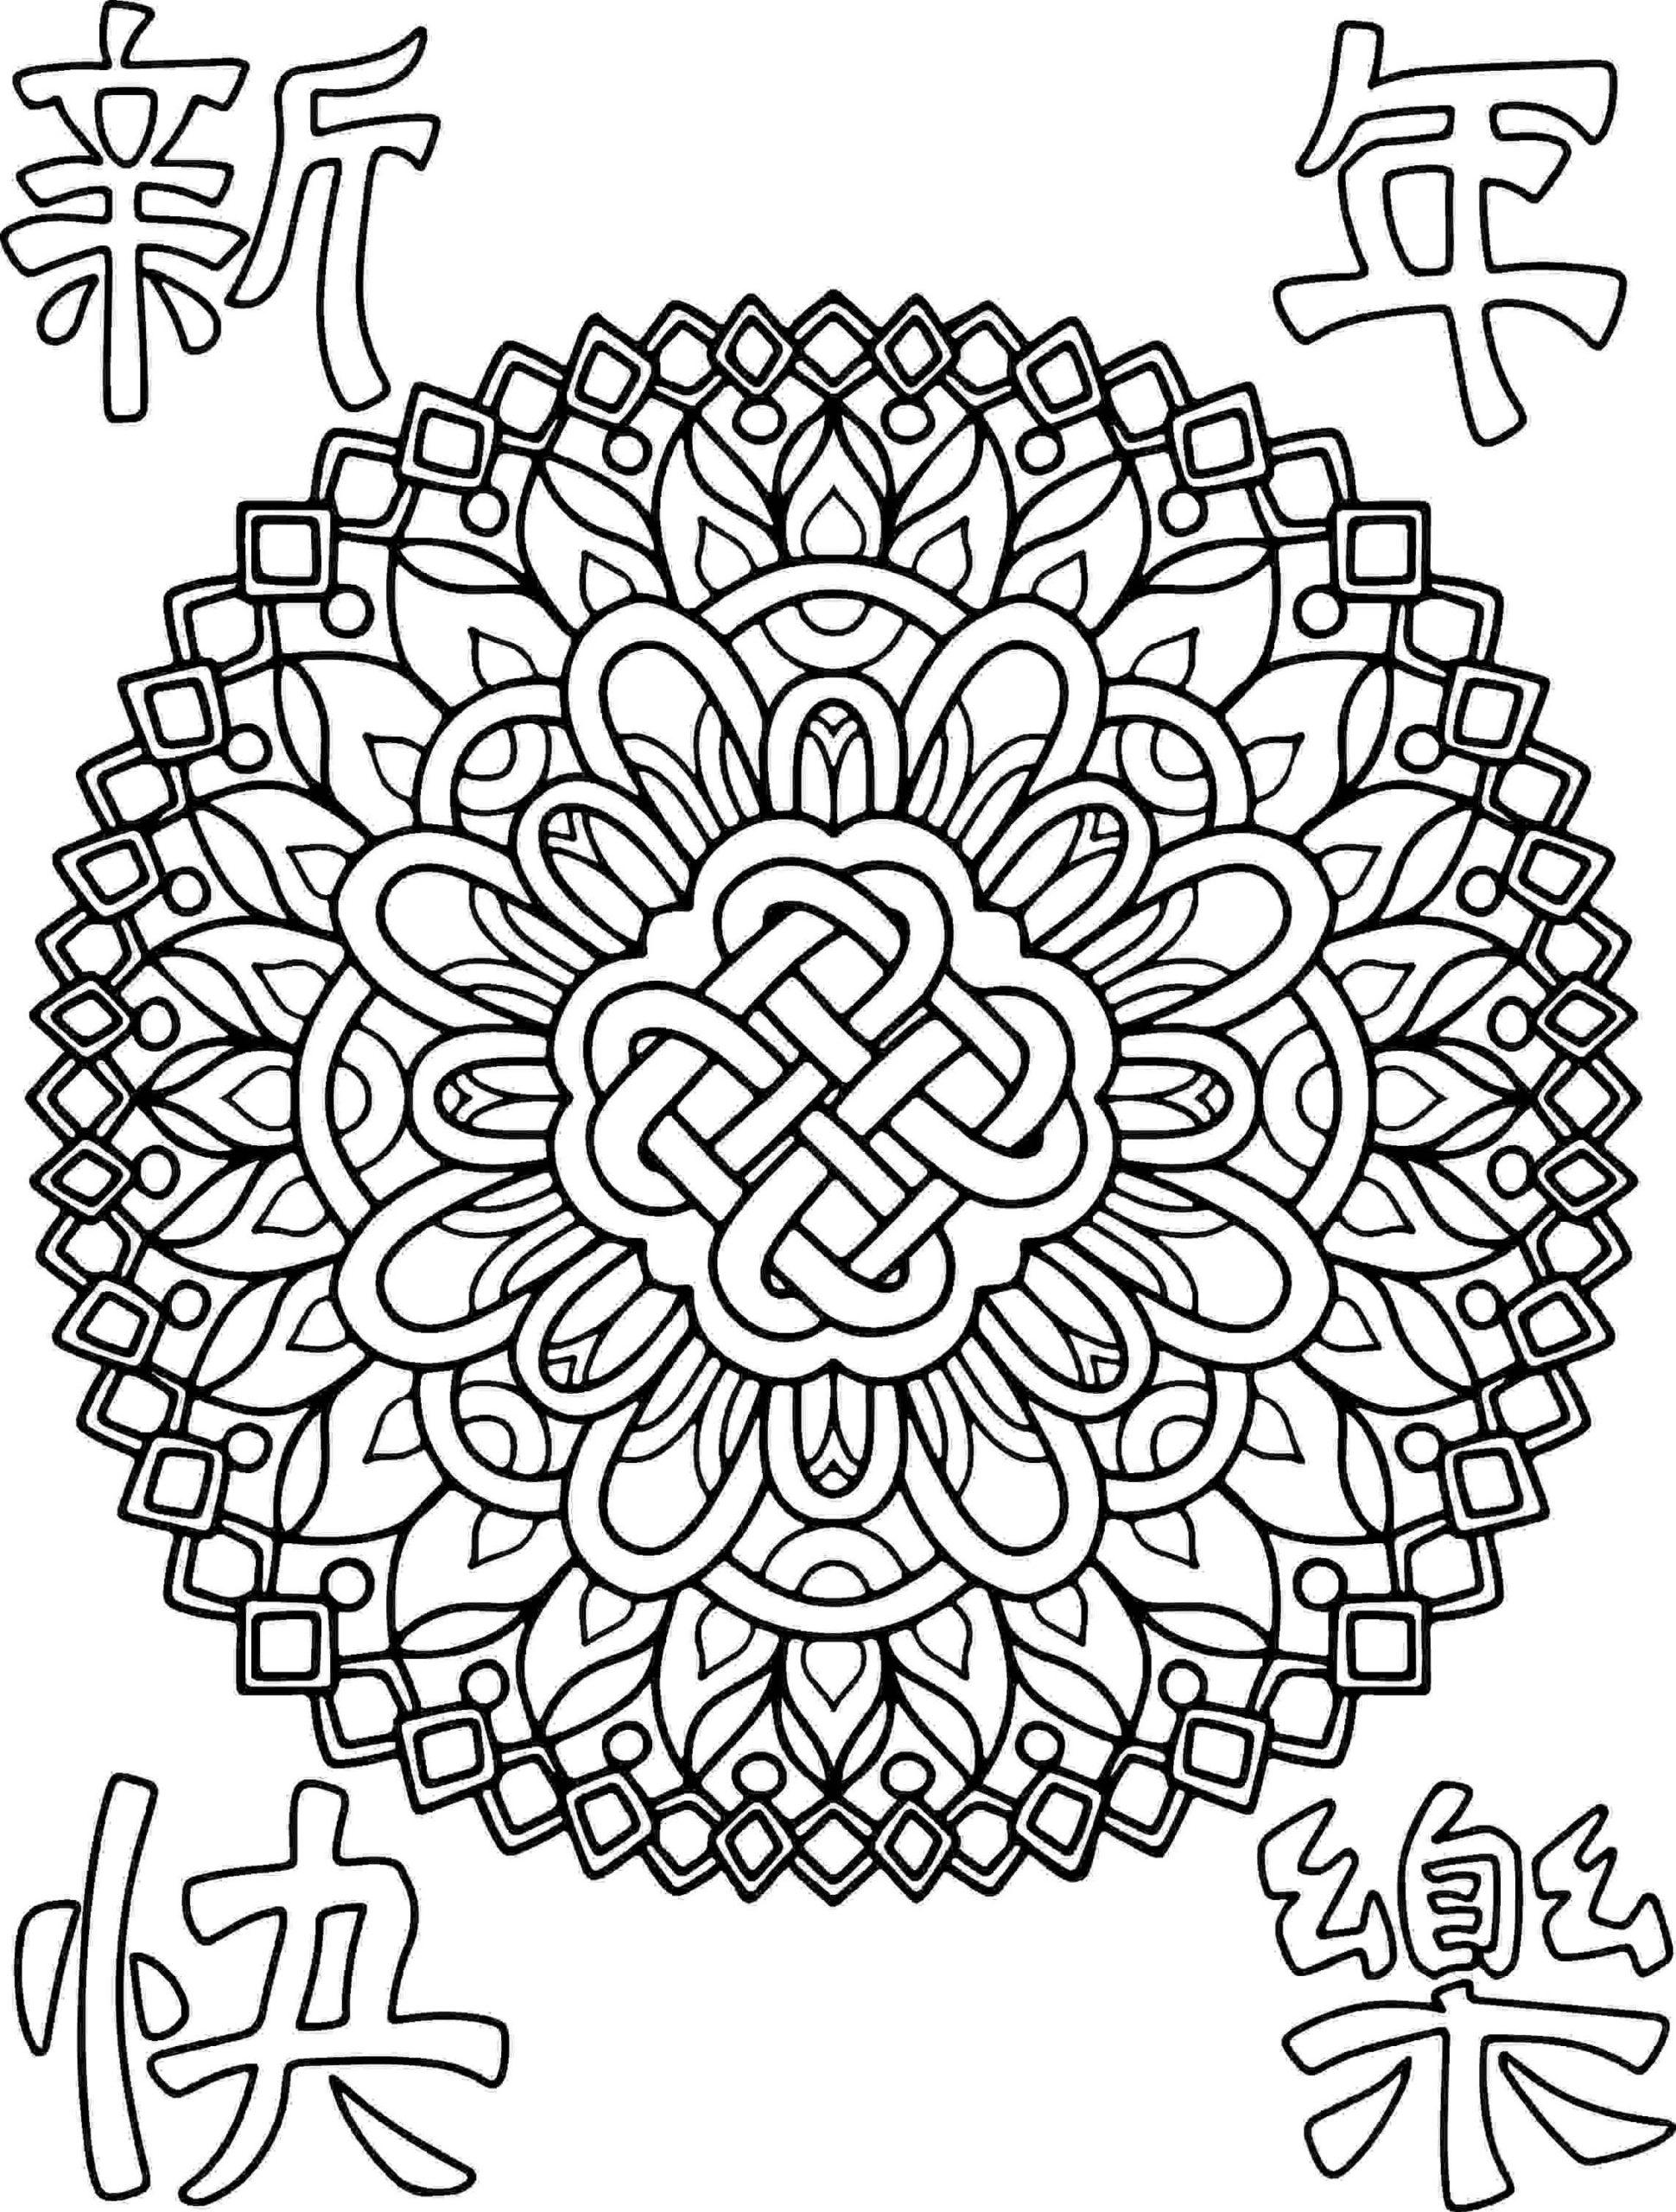 Coloring Pages : Coloring Free Printable Mandala Easter destiné Mandala Fée